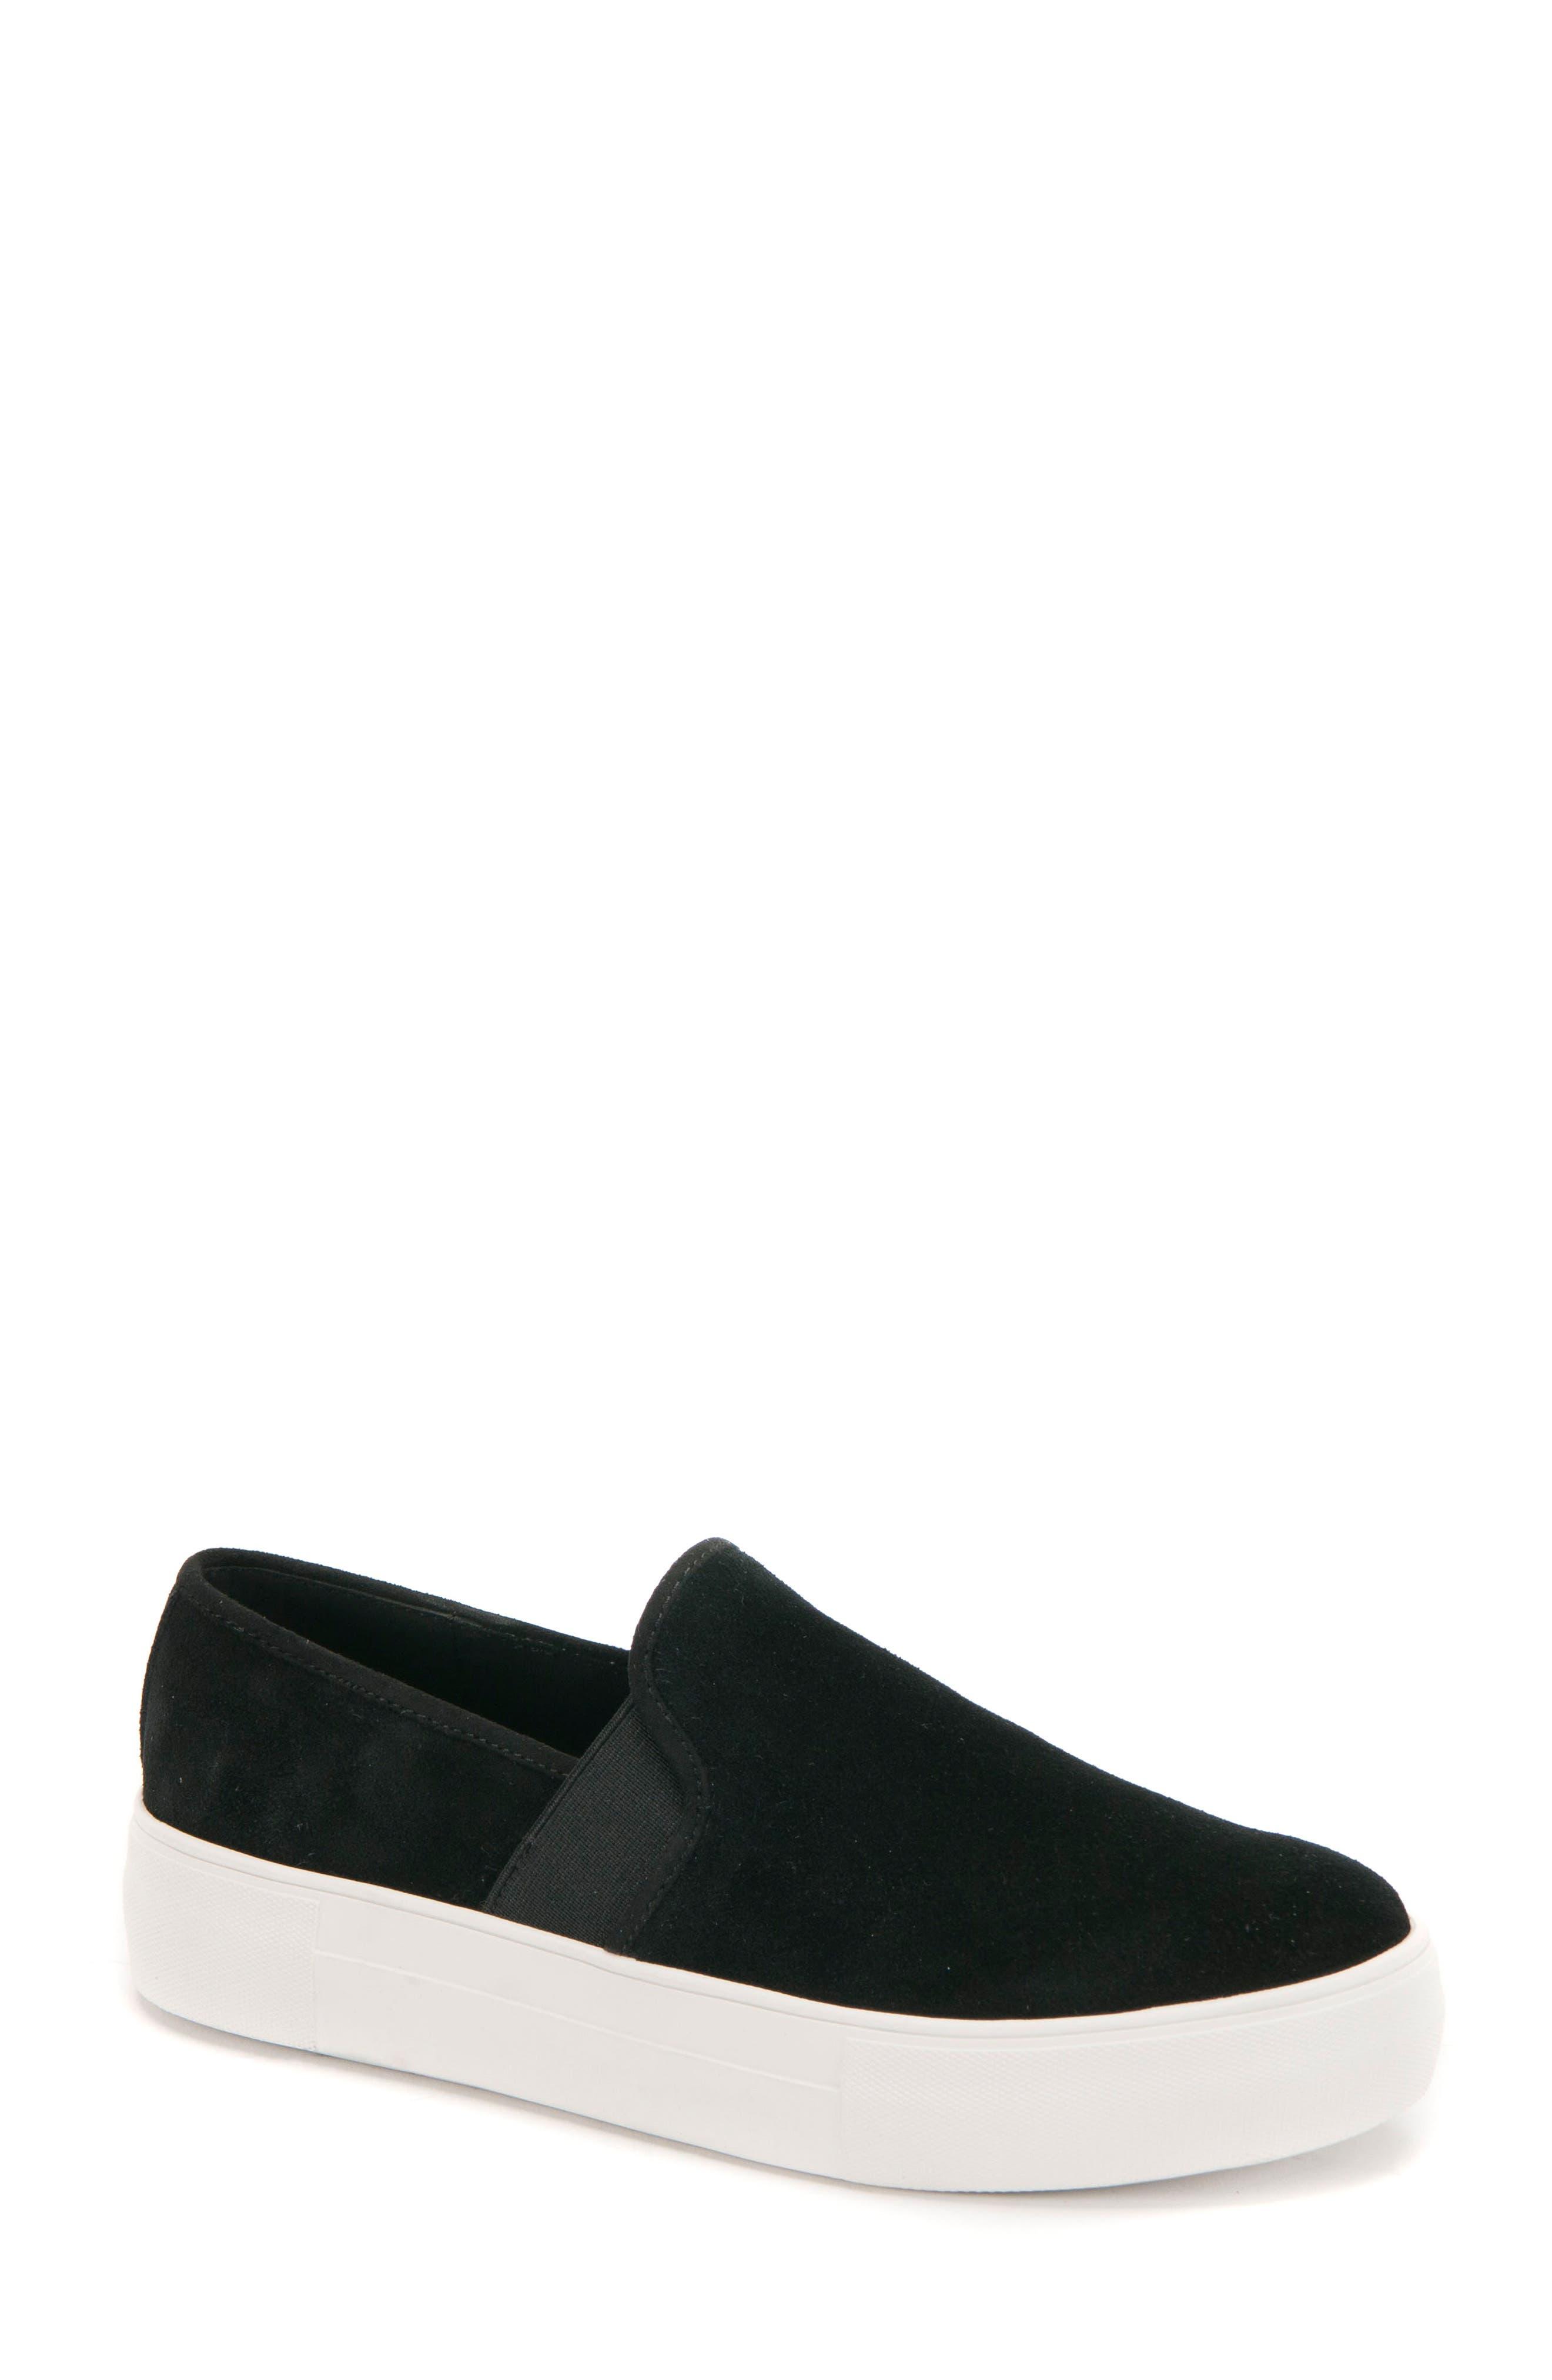 Blondo Glance Waterproof Sneaker, Black